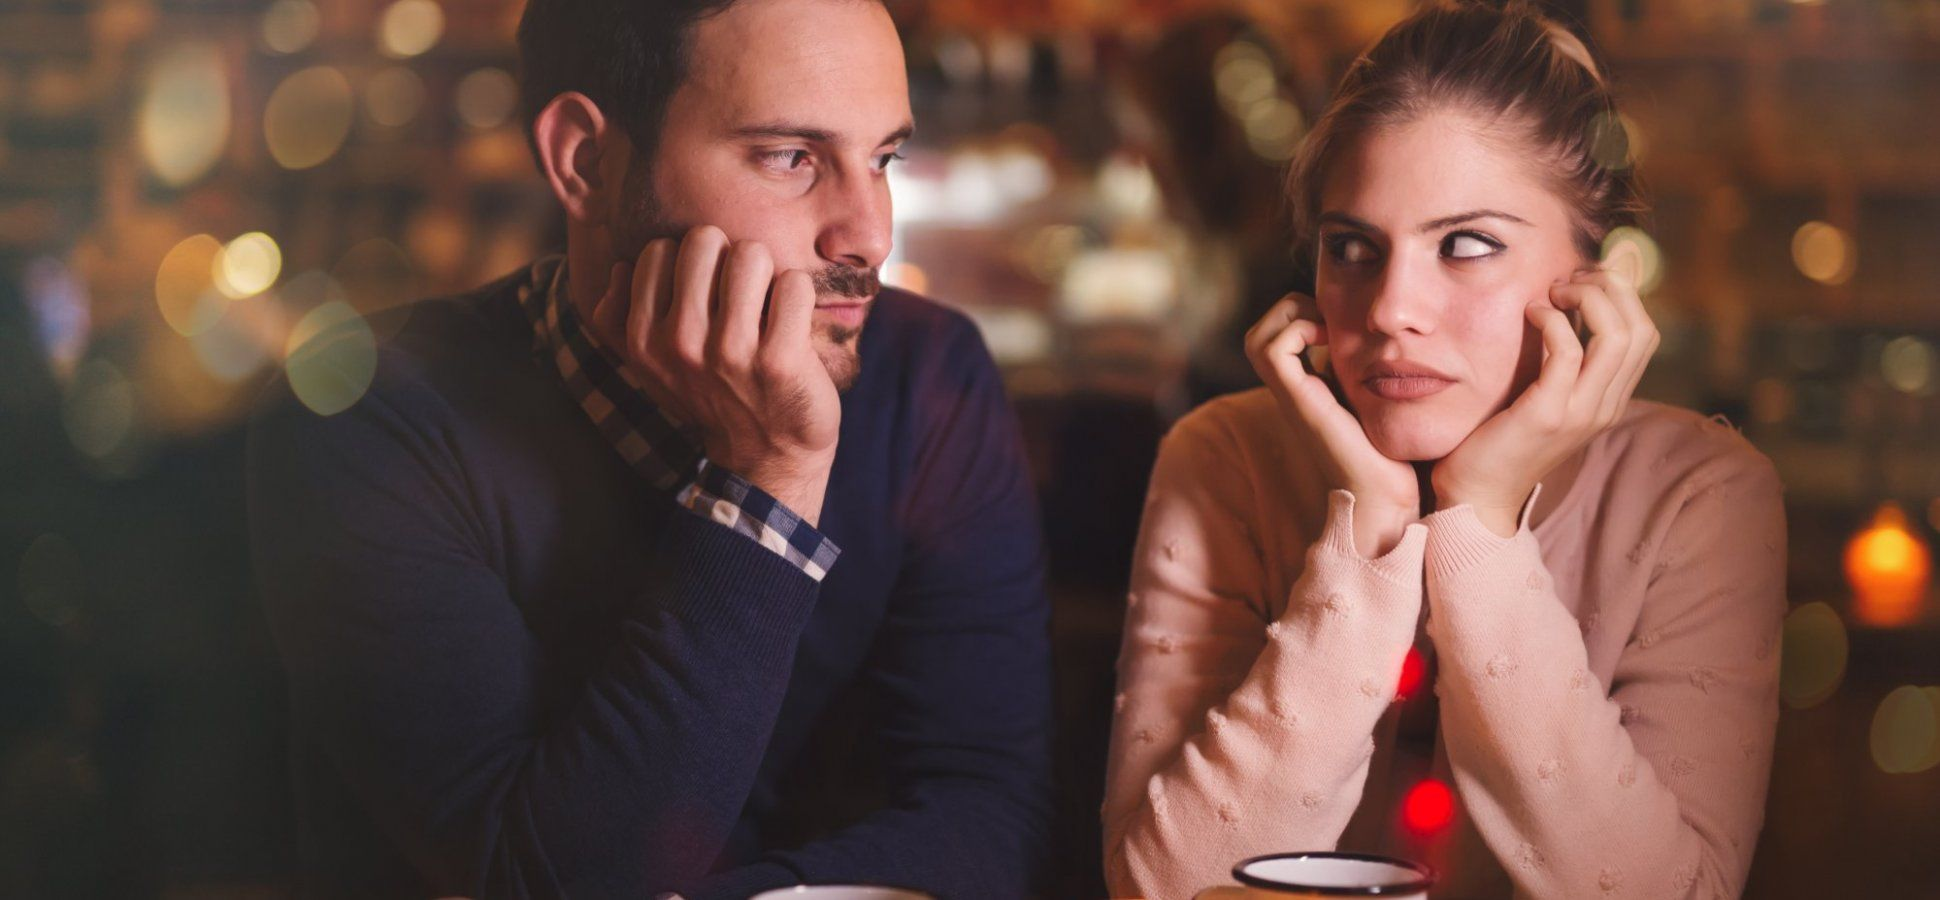 Lakukan 7 Hal Ini Setelah Bertengkar dengan Pasangan